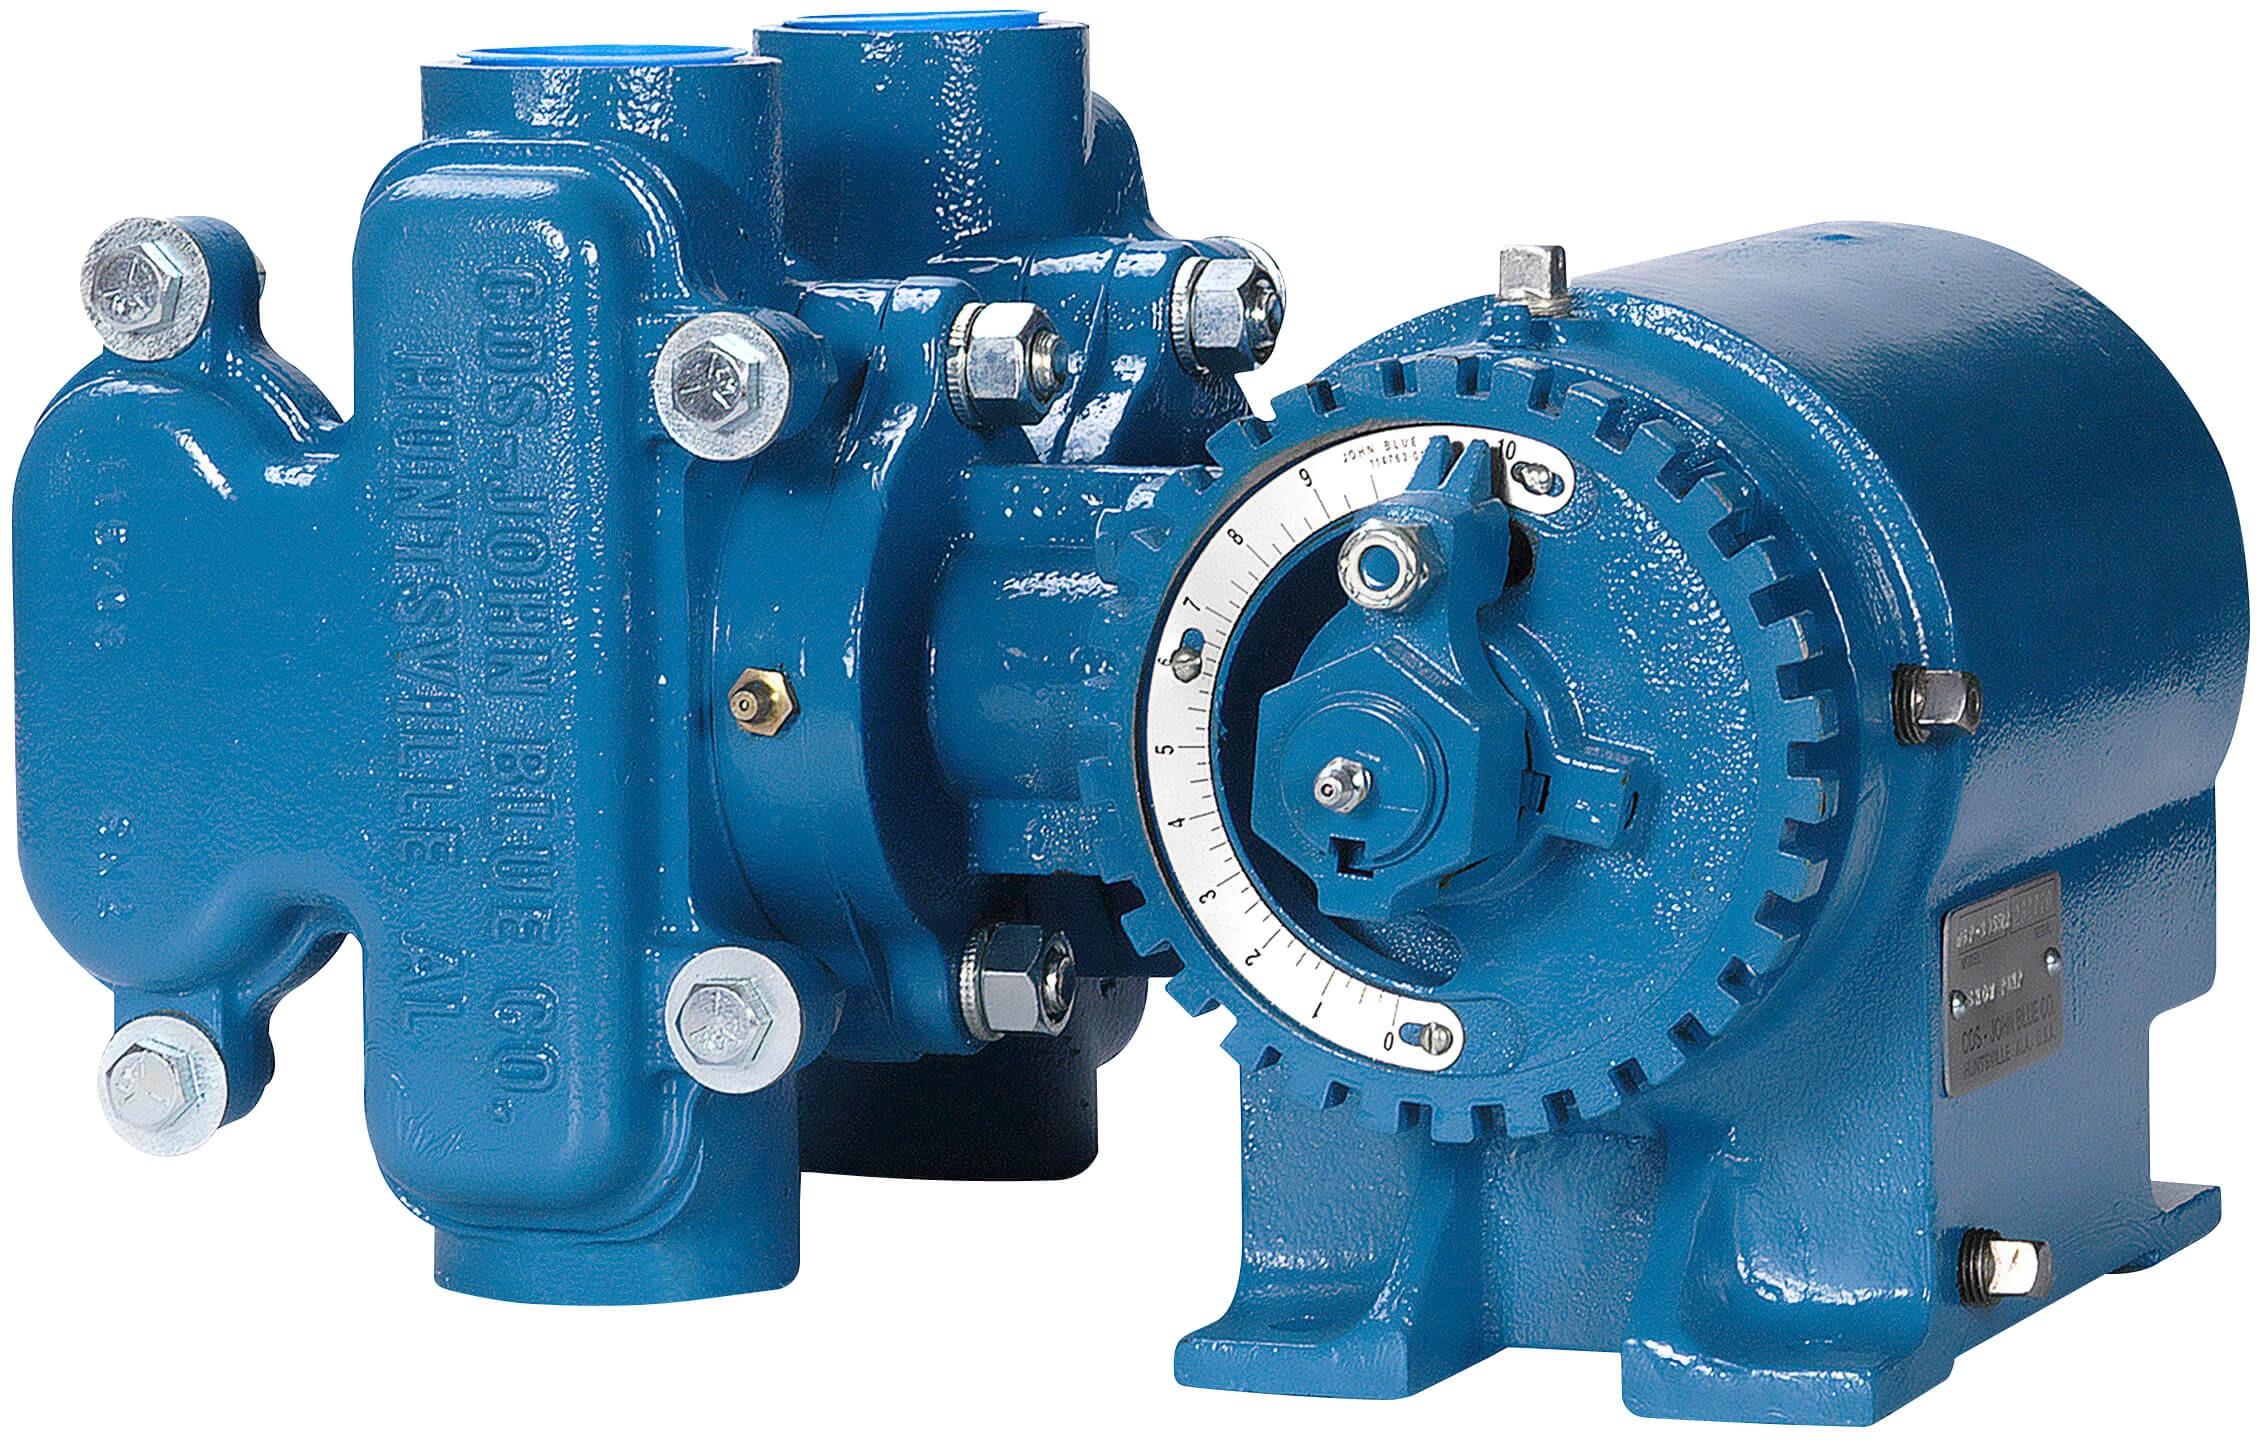 Ngp 8050 Cds John Blue Cast Iron Piston Pump 2 Quot Npt X